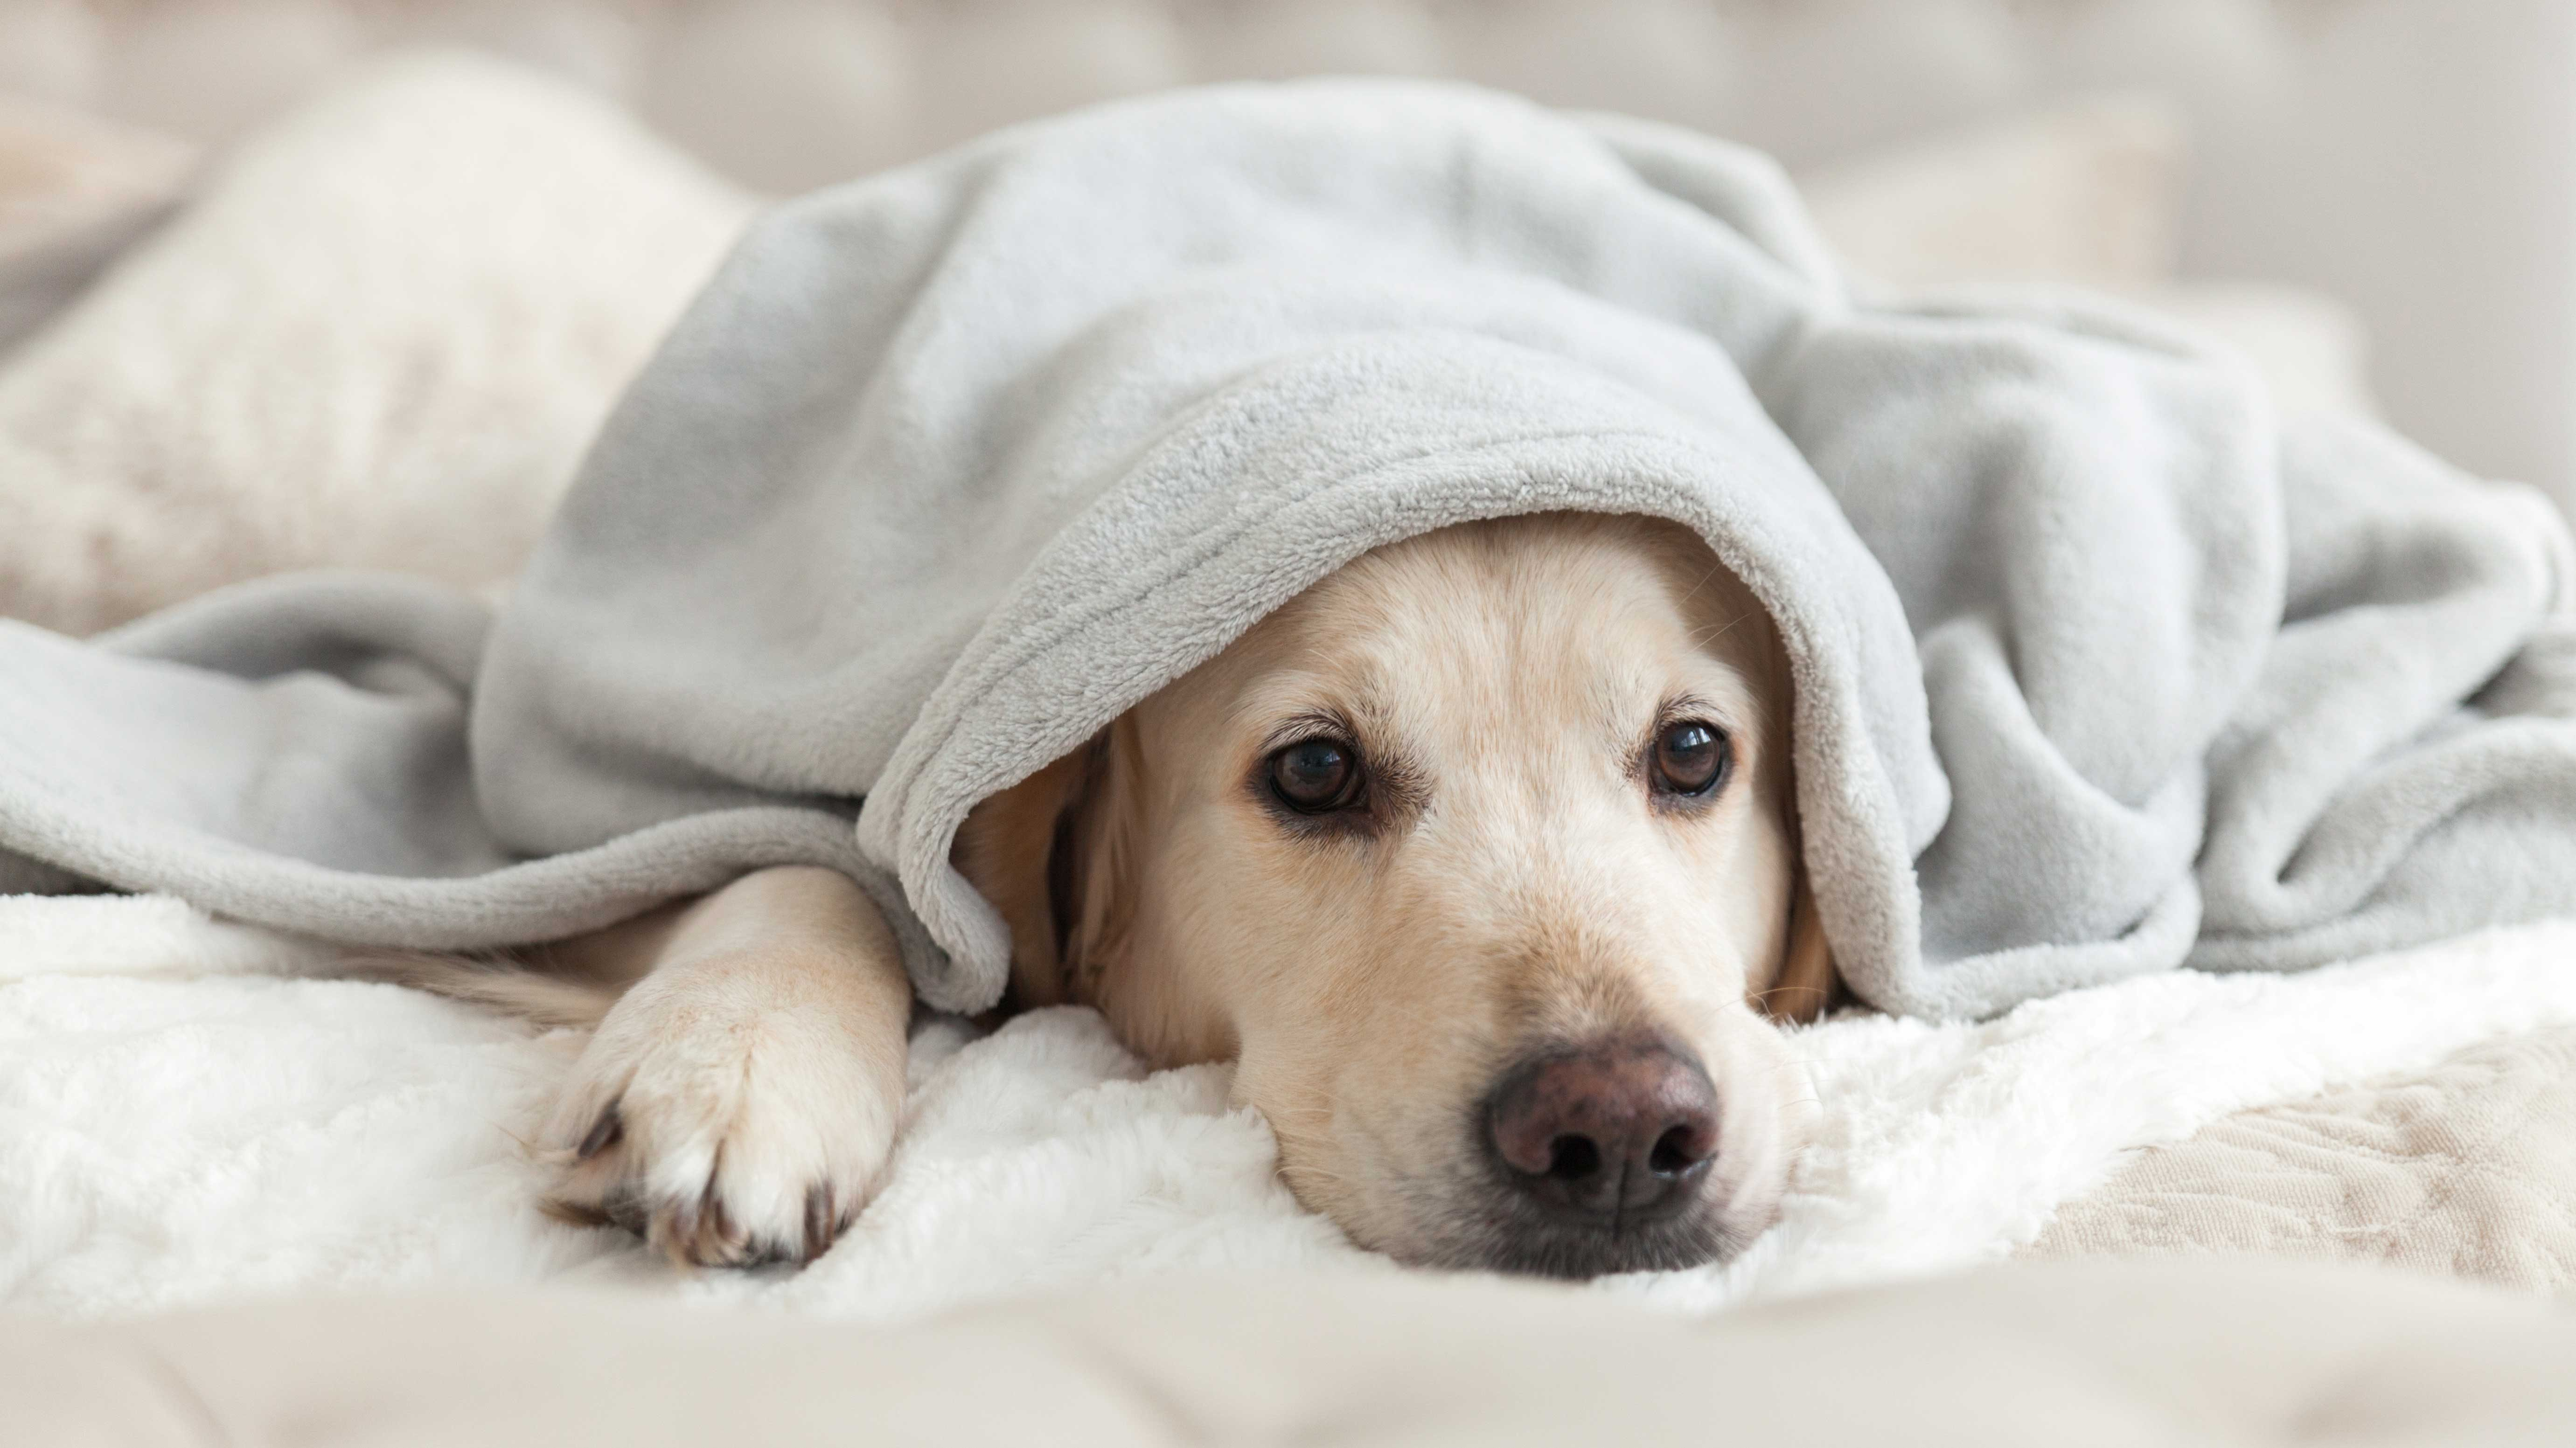 Dog Seizure Symptoms To Watch Out For Reader S Digest,Green Tea Caffeine Pills